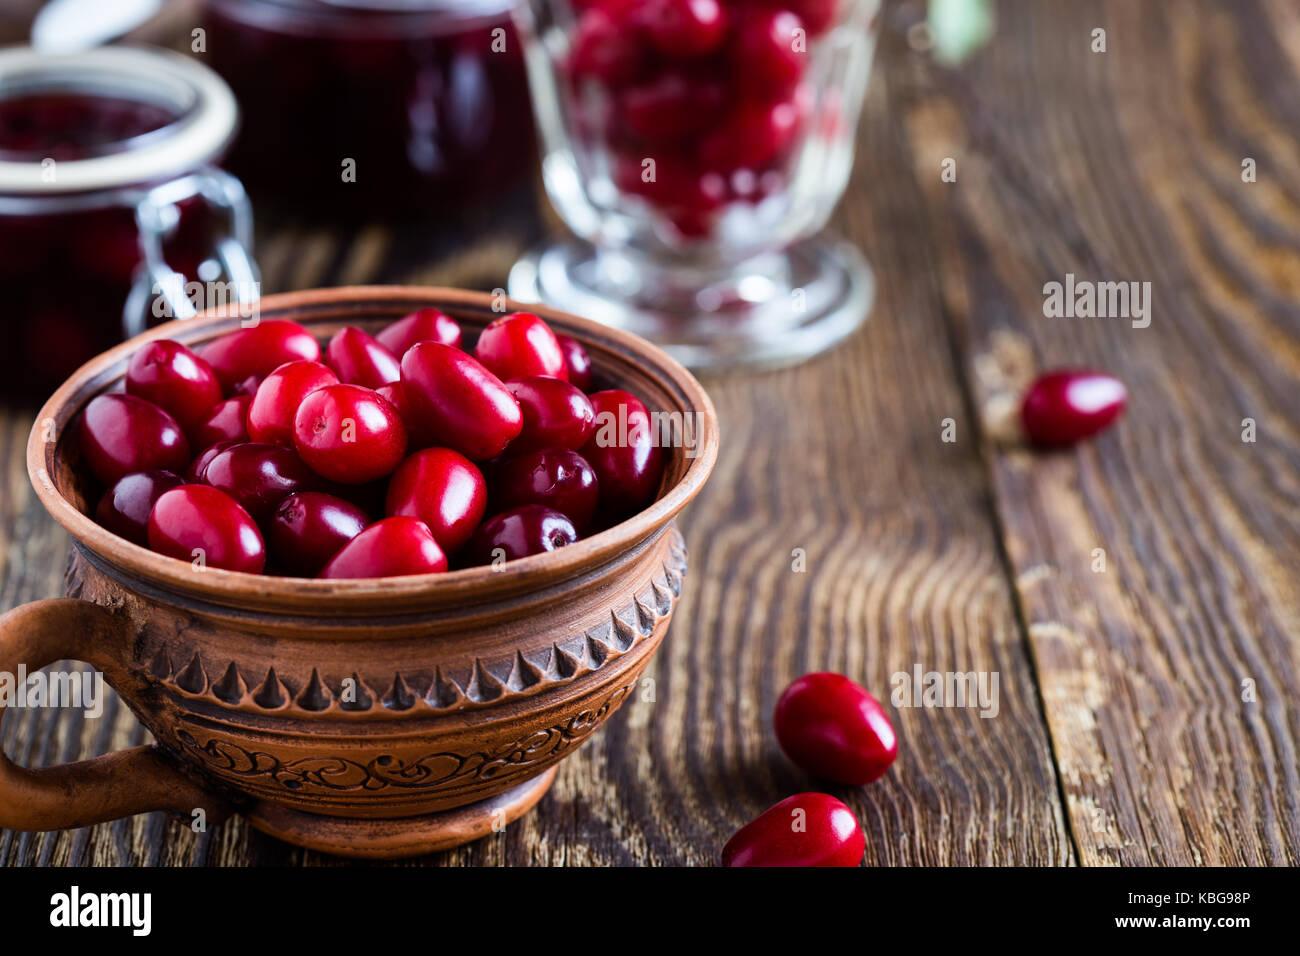 Ripe cornel berries in ceramic mug and dogwood jam on rural wooden background Stock Photo